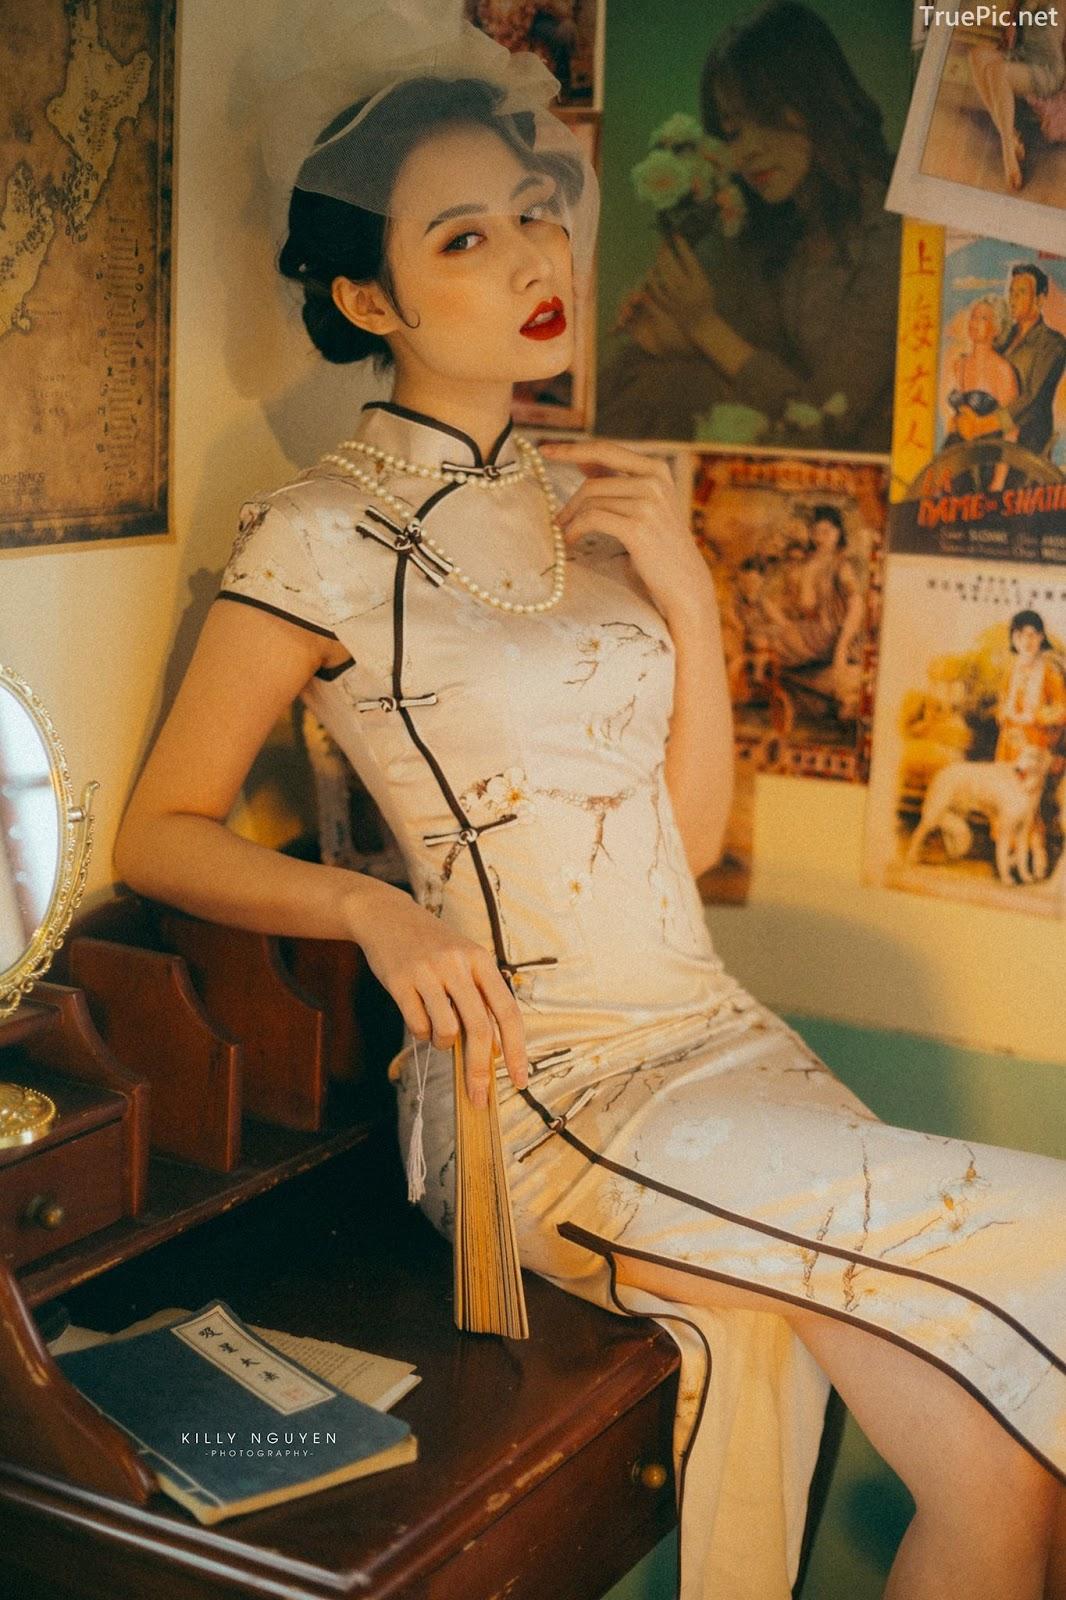 Vietnamese model Lan Huong - Lost in ShangHai - Photo by Killy Nguyen - TruePic.net - Picture 2